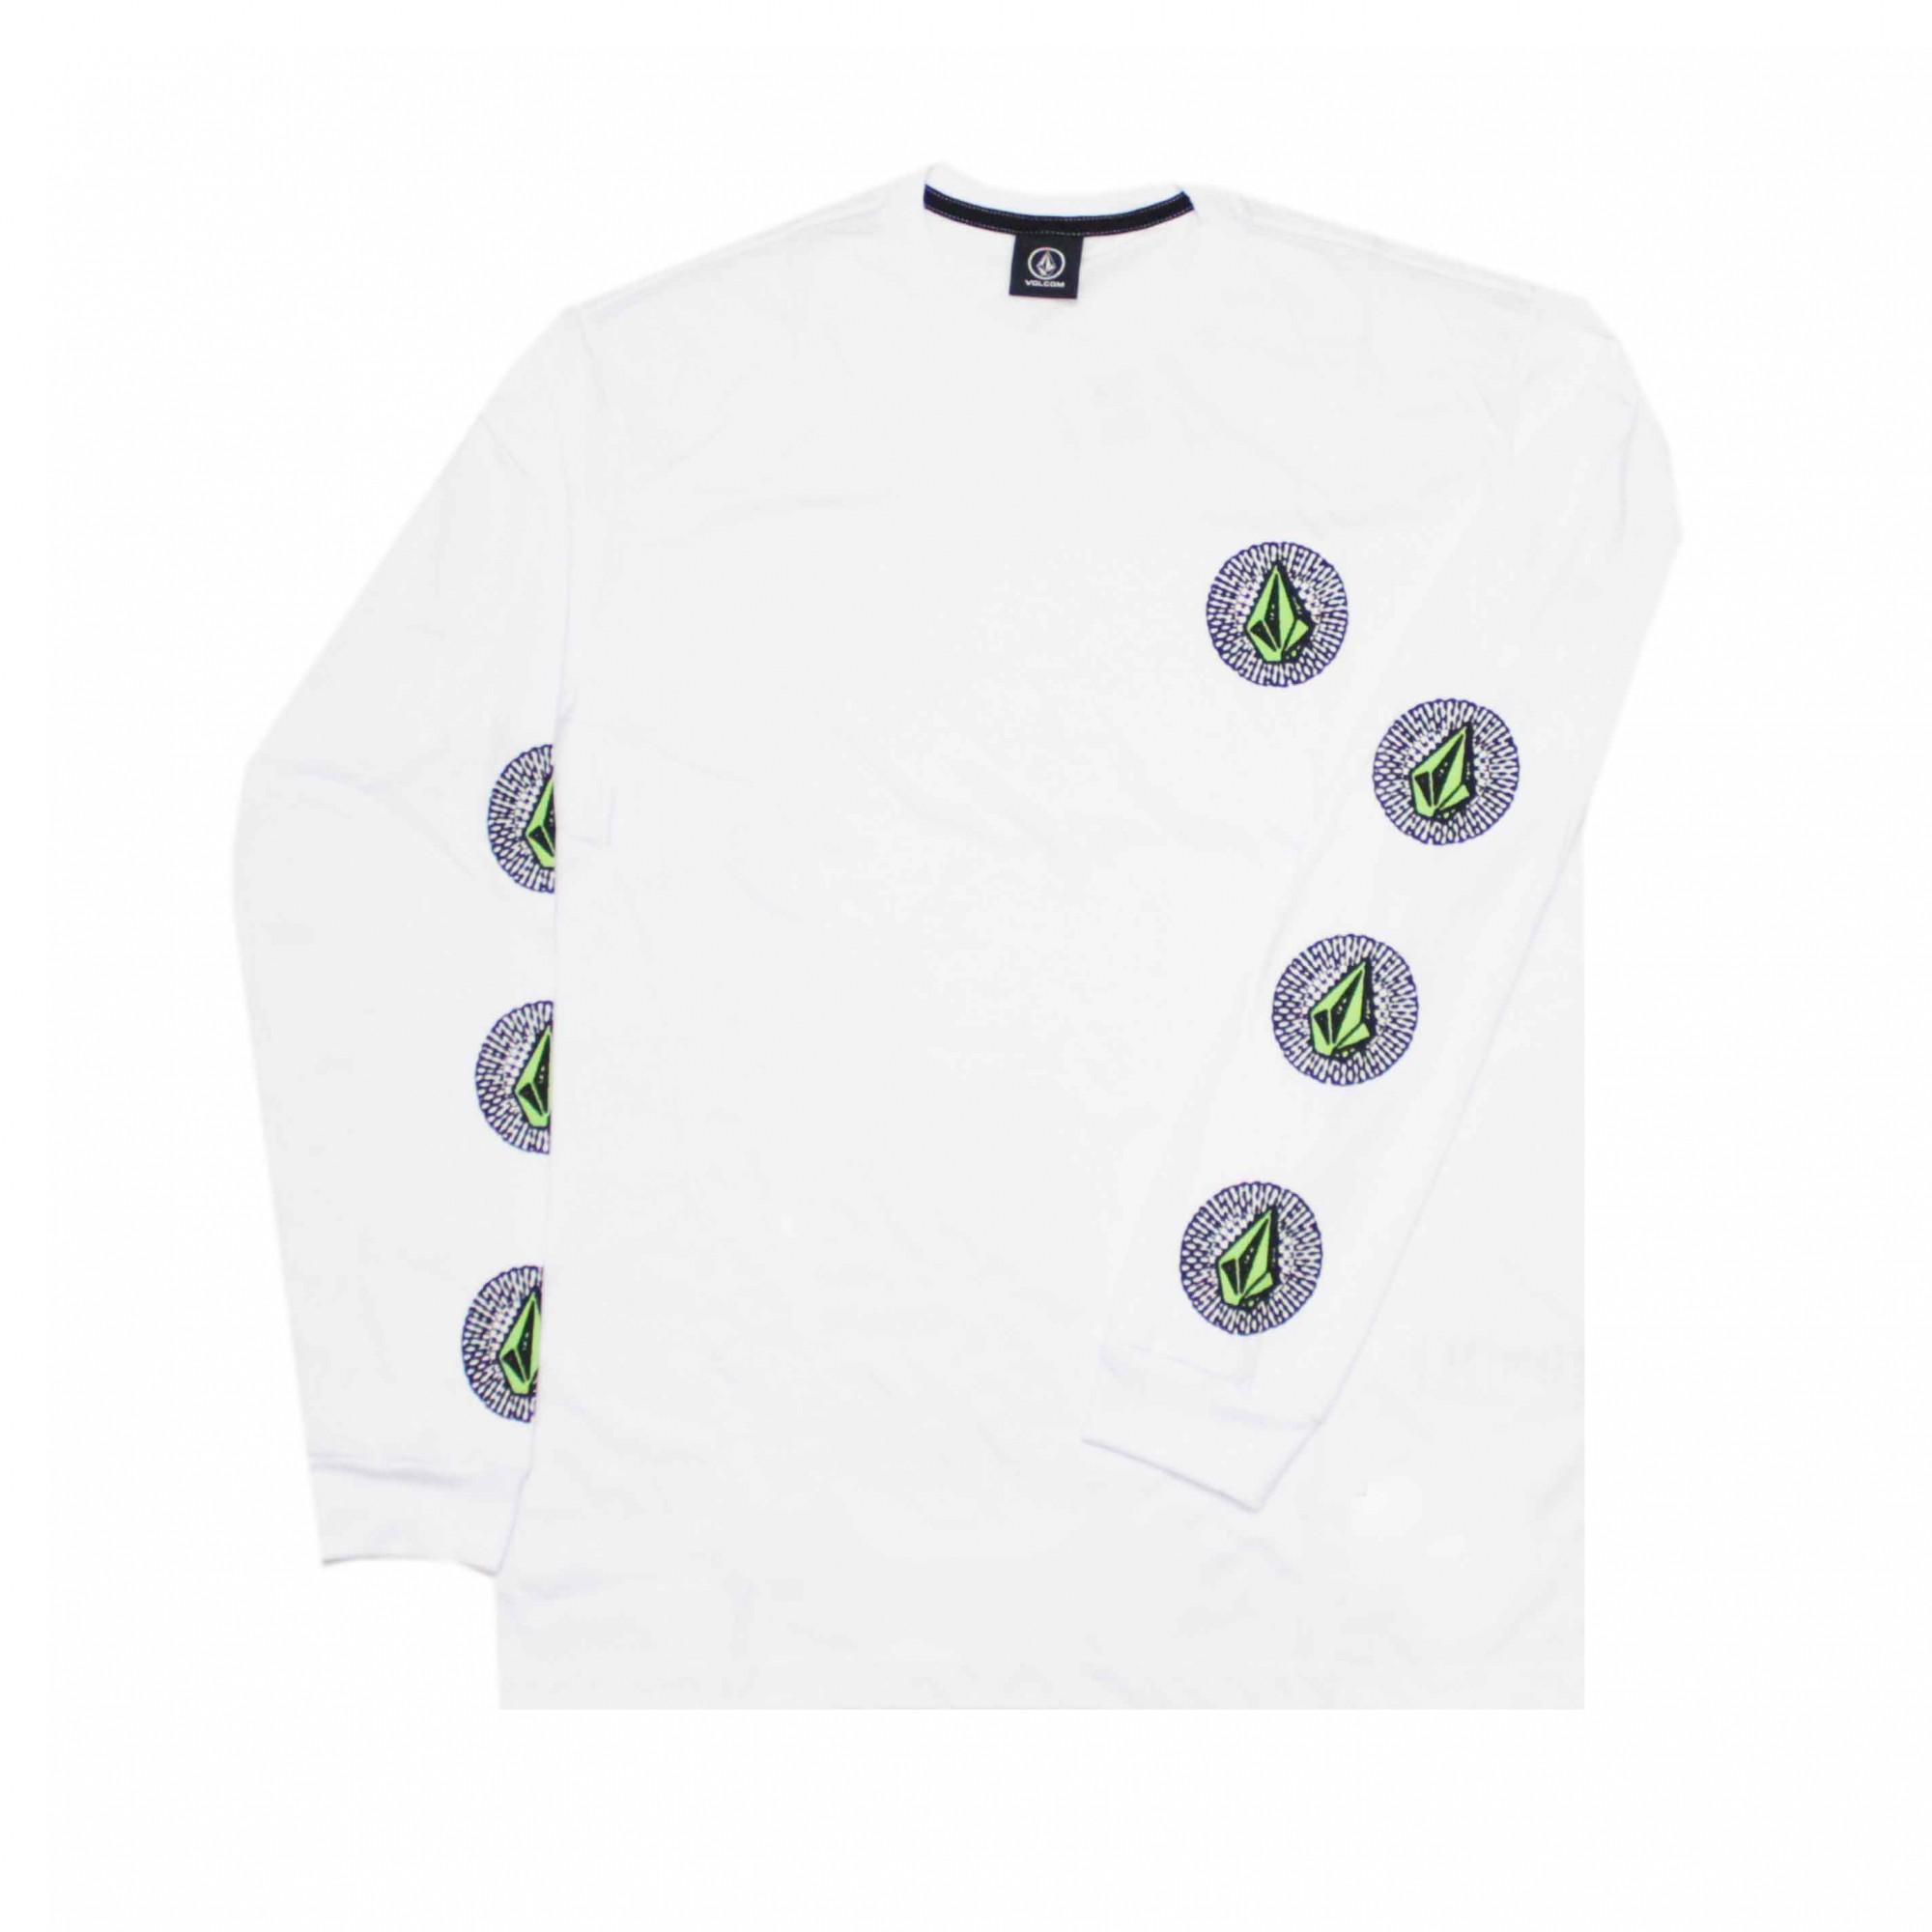 Camiseta Manga Longa Volcom Future Stones Branco